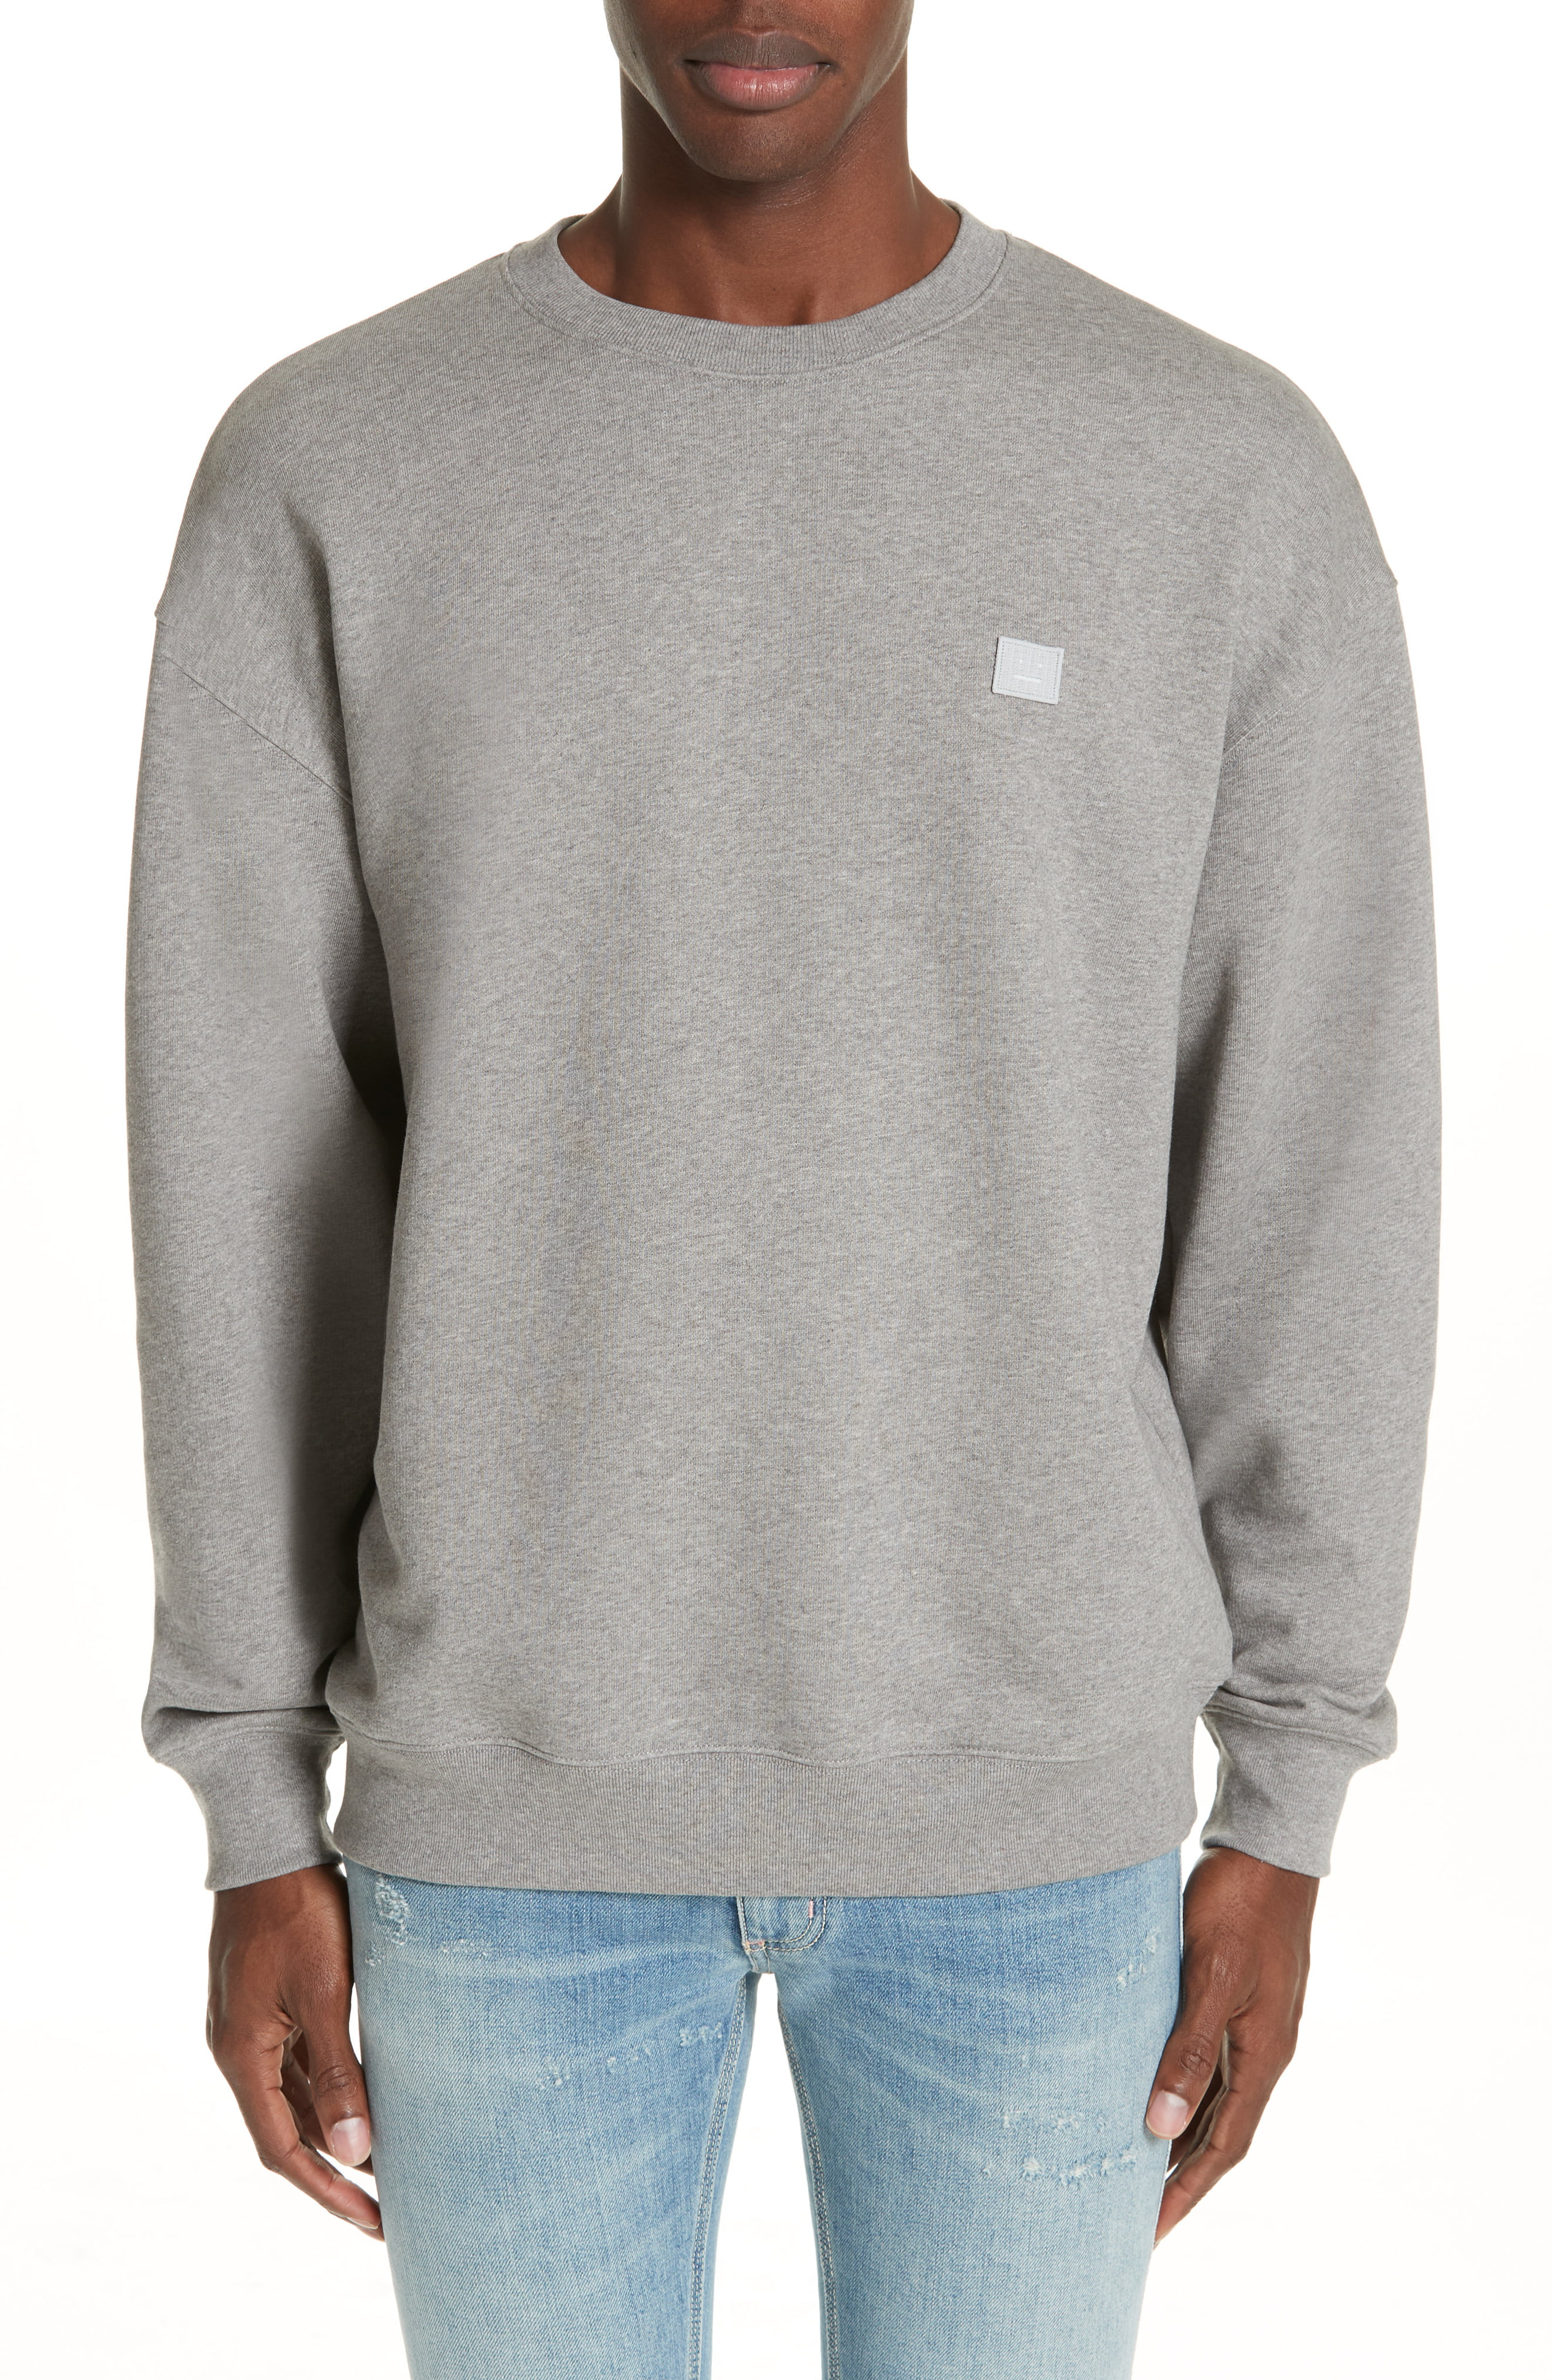 Men S Acne Studios Forba Face Sweatshirt Size X Large